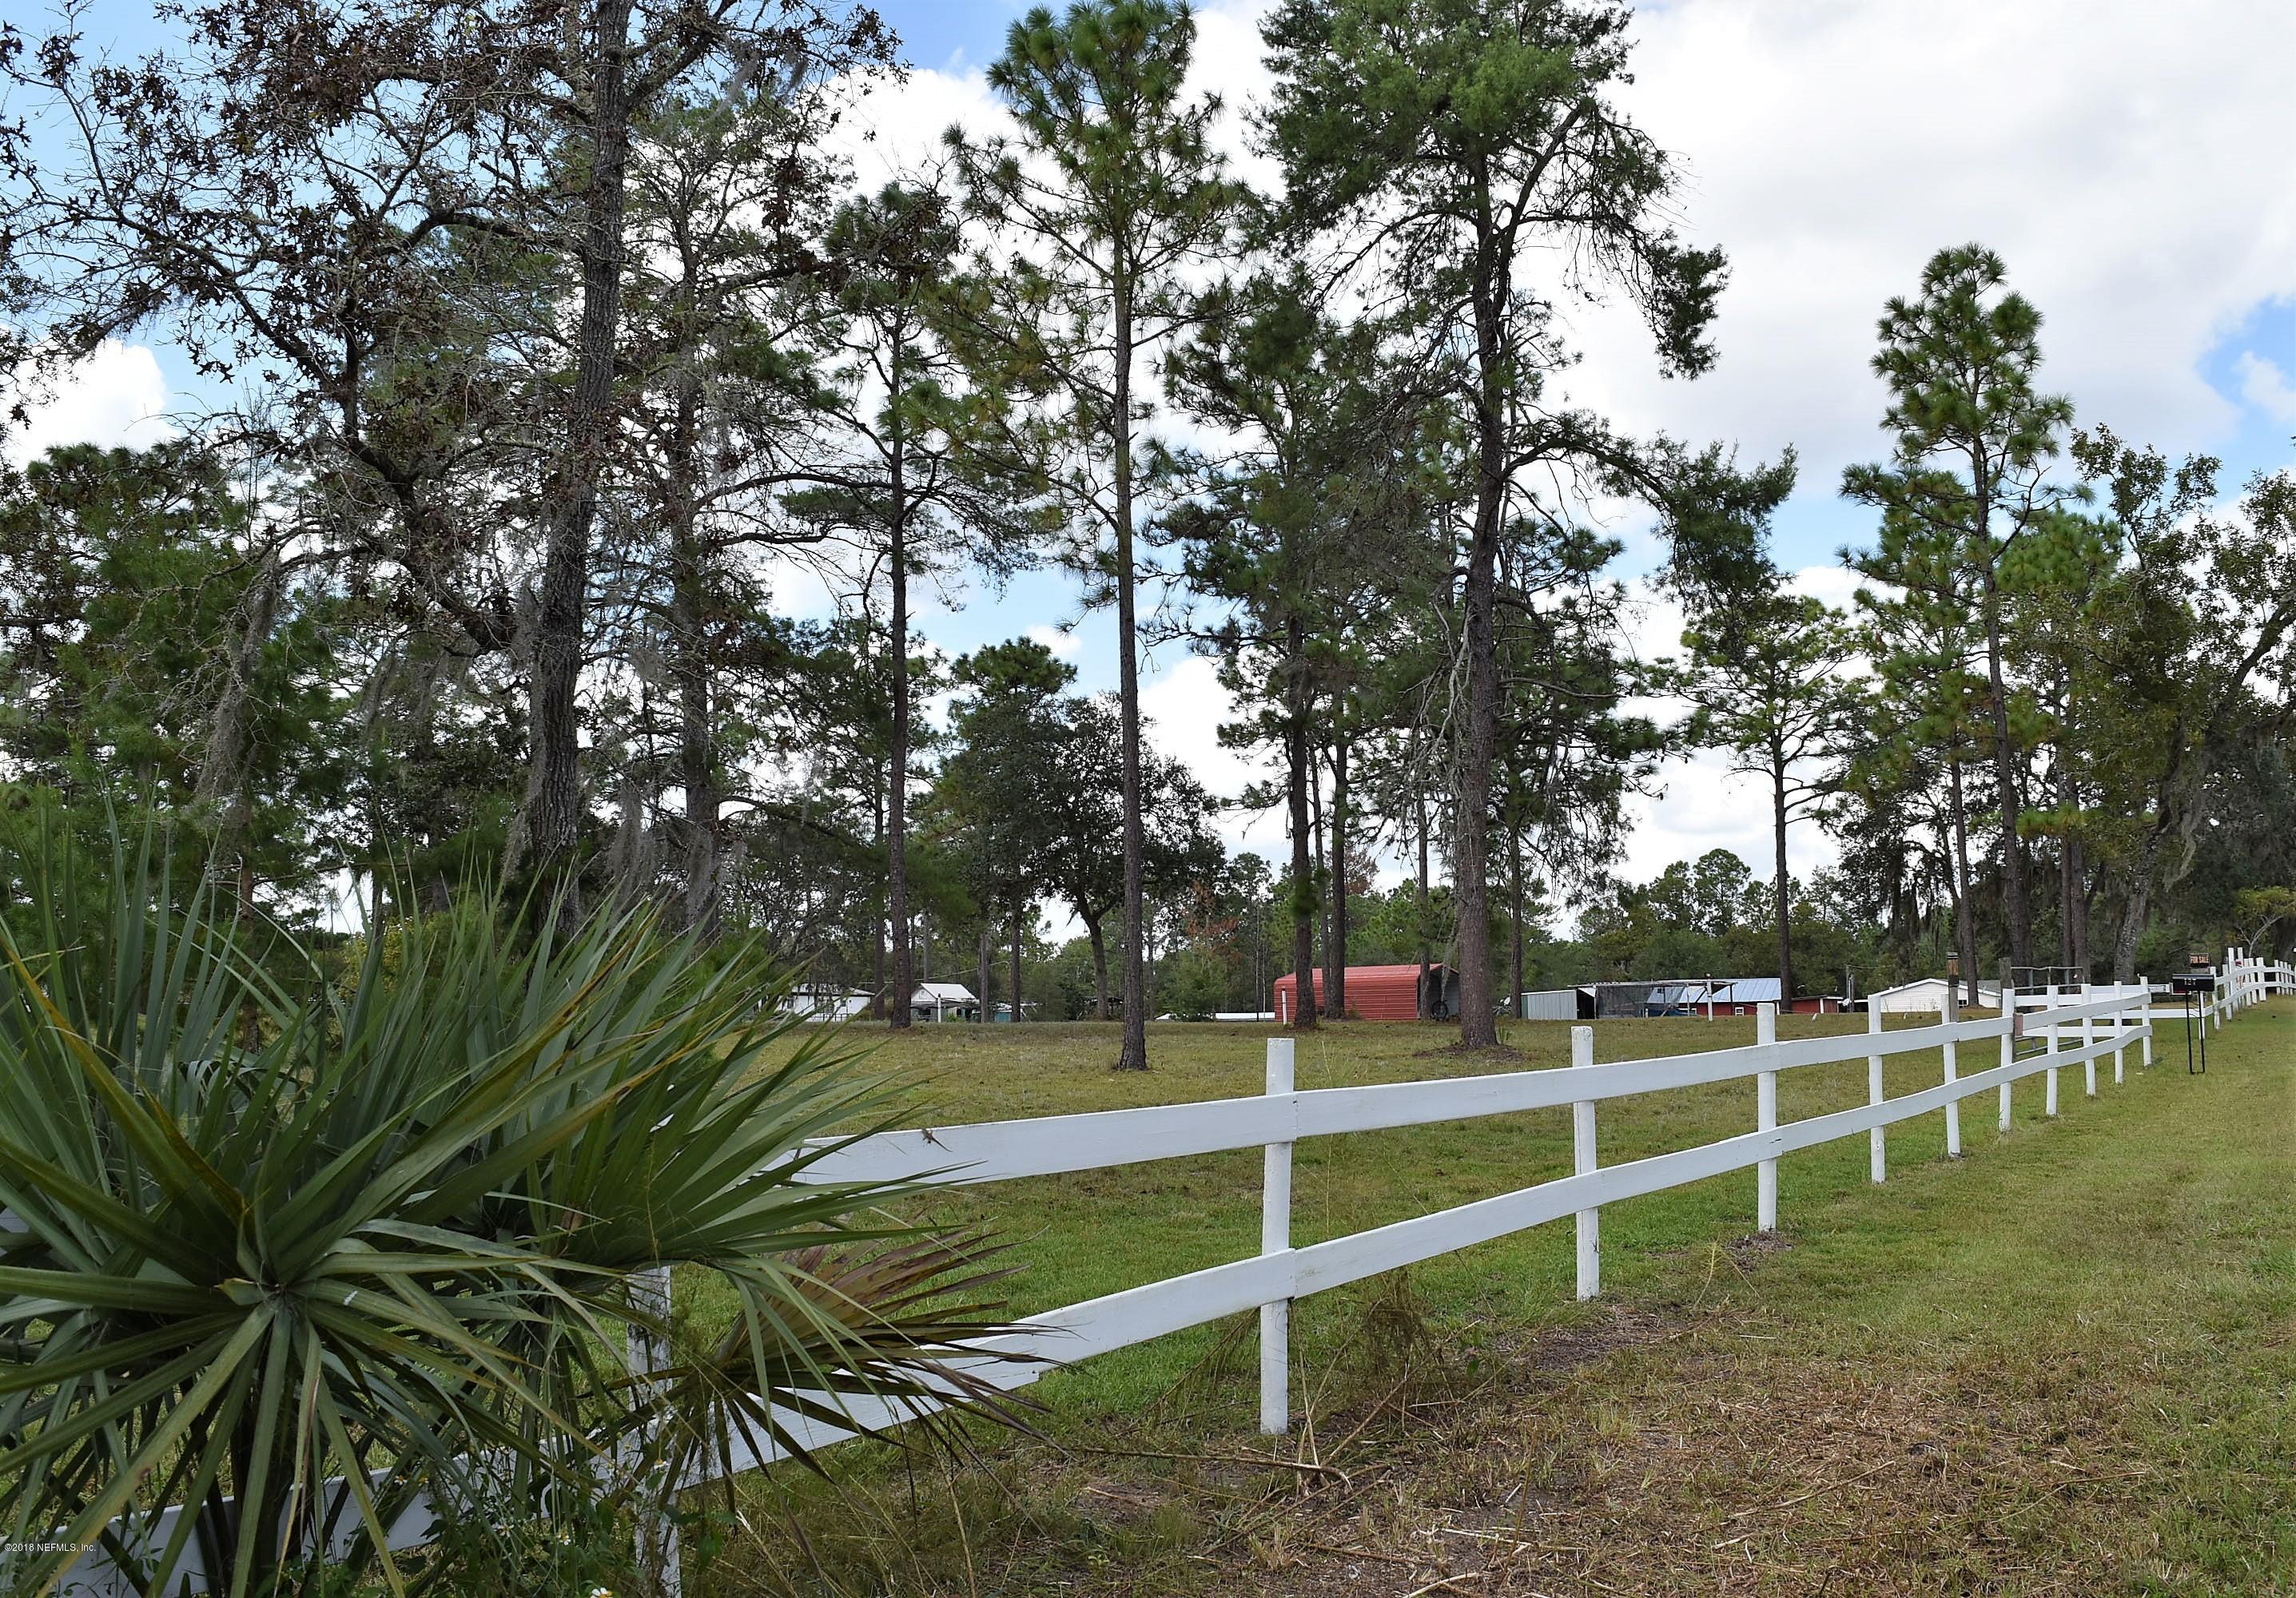 127 BURLEIGH, POMONA PARK, FLORIDA 32181, ,Vacant land,For sale,BURLEIGH,922977